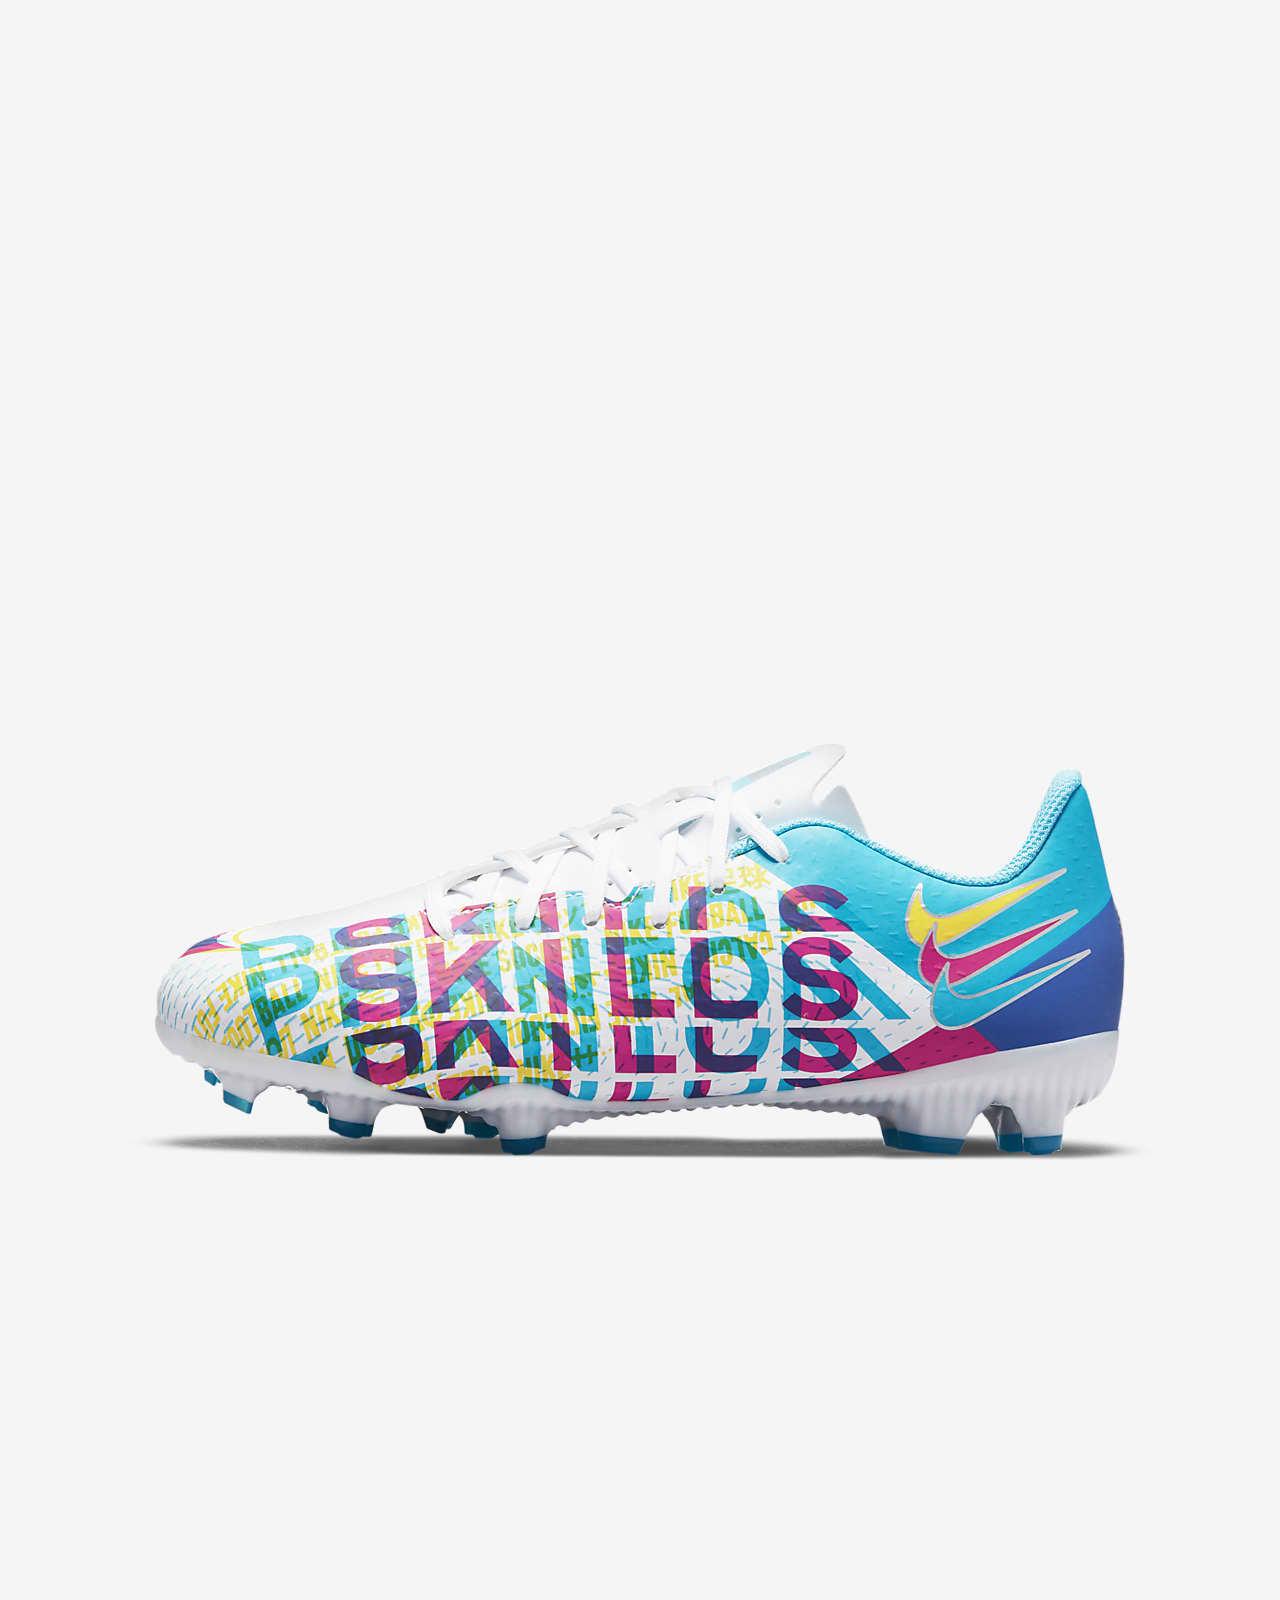 Scarpa da calcio multiterreno Nike Jr. Phantom GT Academy 3D MG - Bambini/Ragazzi